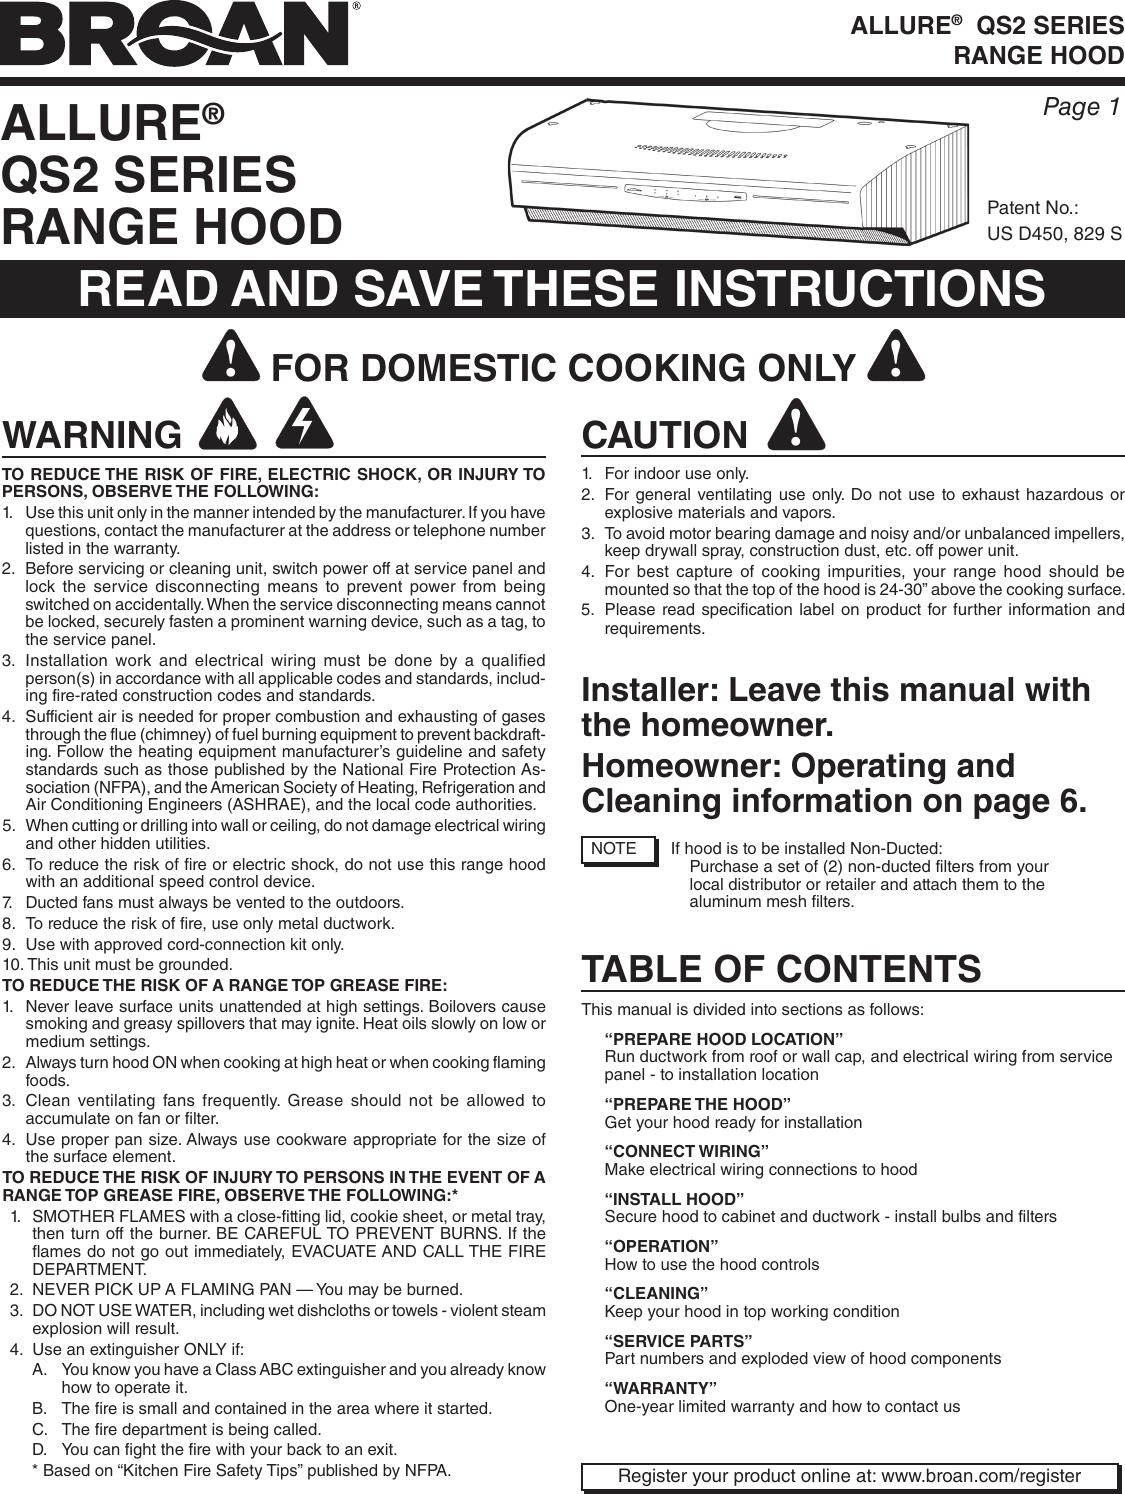 Broan QS236BL User Manual To The 3c0327e0 36a7 4a33 8dba 9dbb952a18b3